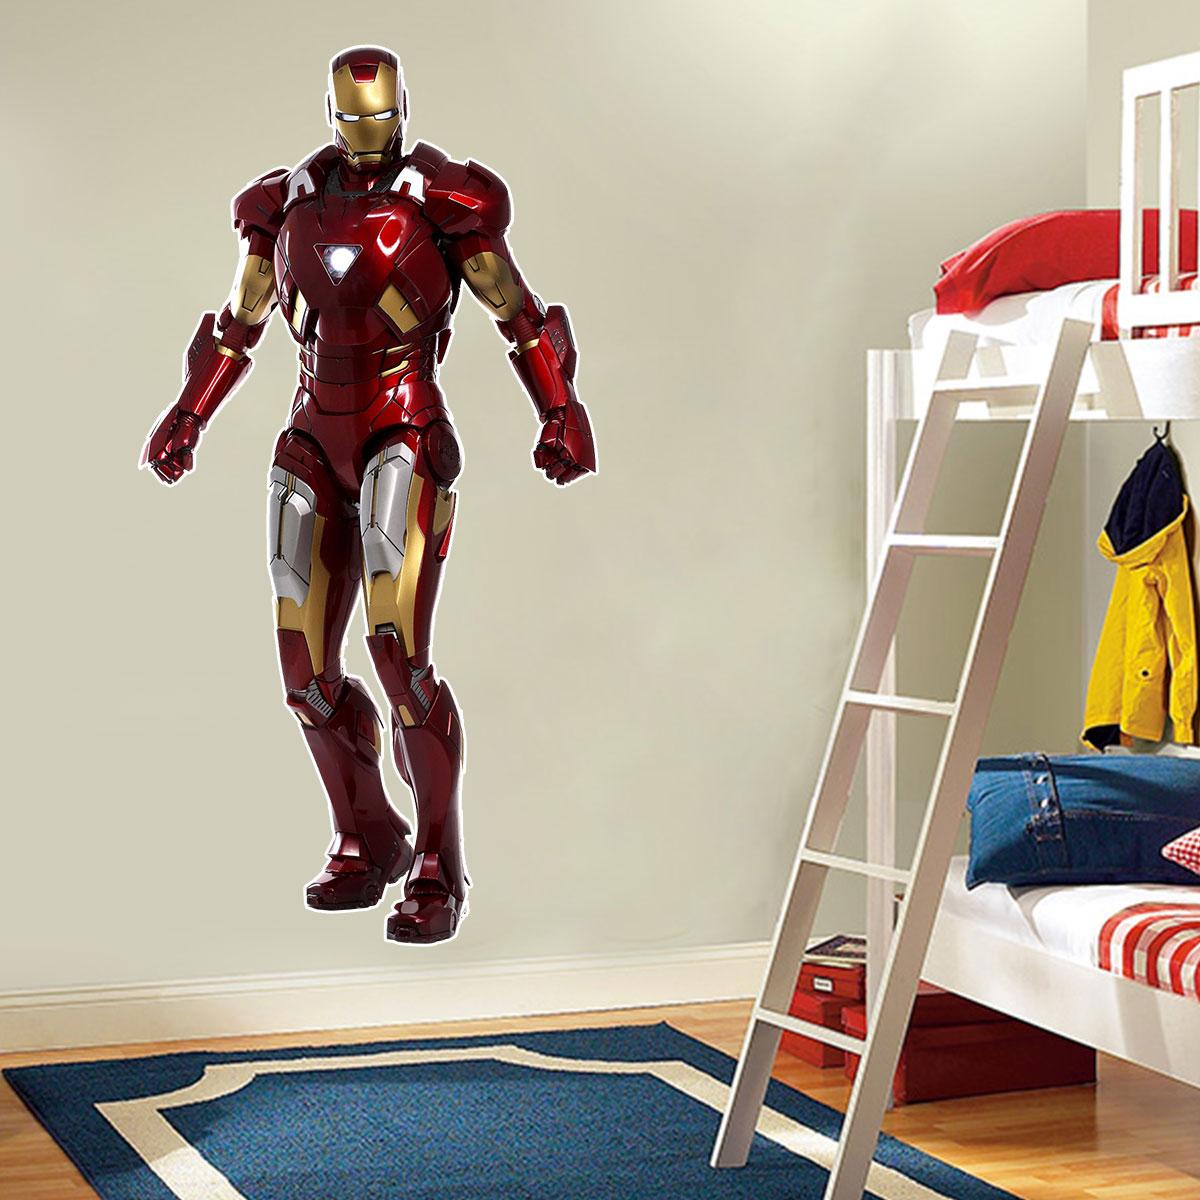 Adesivo Roupa Ferro ~ Adesivo Infantil Homem De Ferro Super Herói